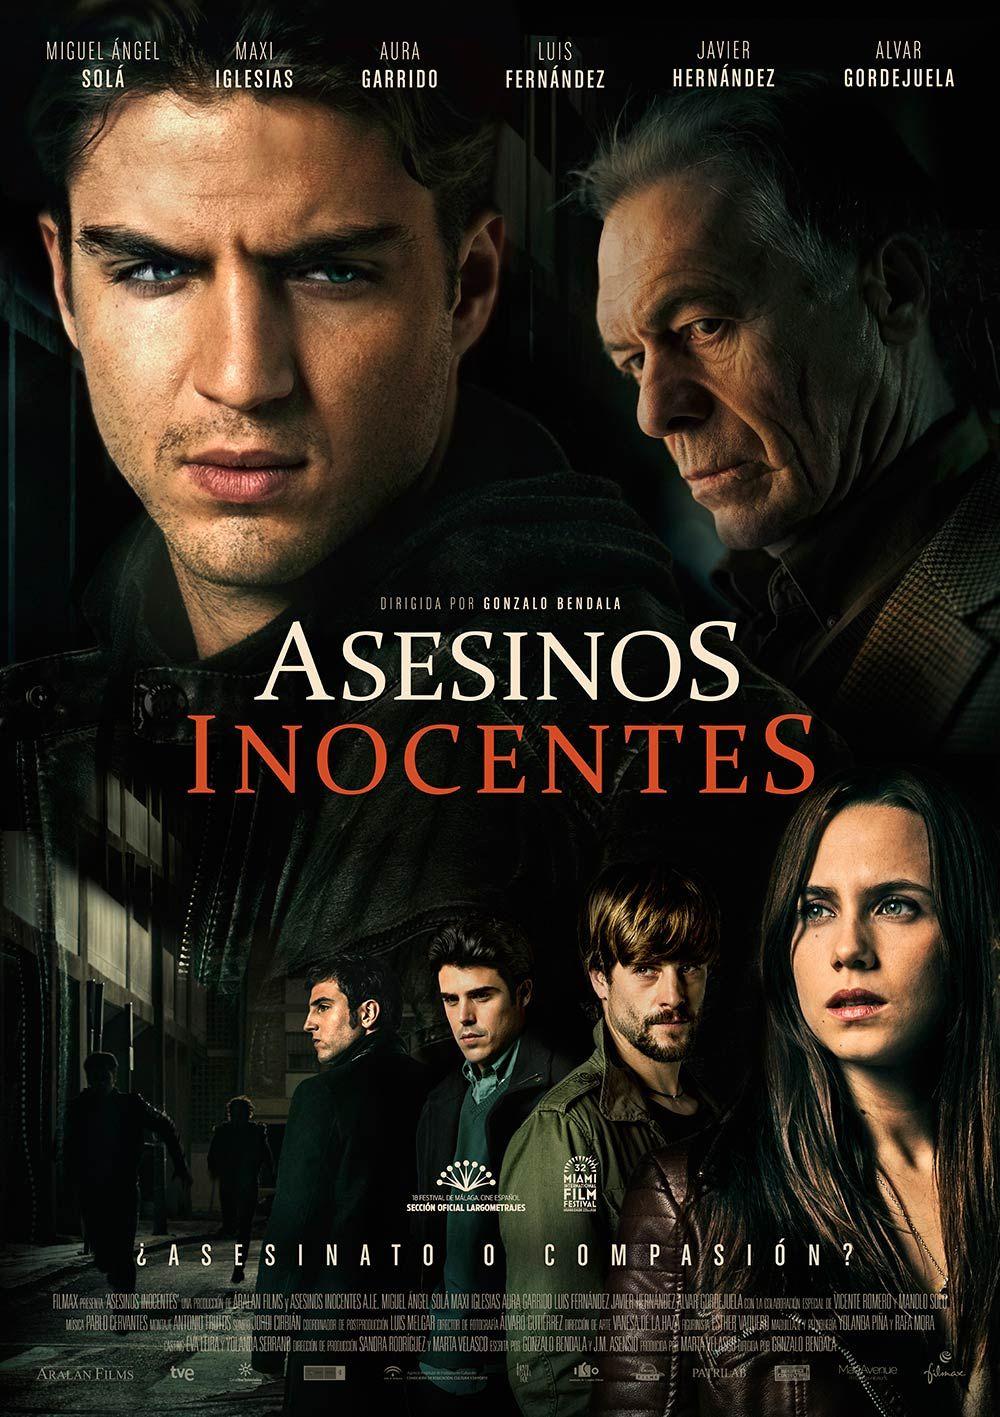 Asesinos Inocentes Buscar Con Google Thriller Movies Movies Free Movies Online